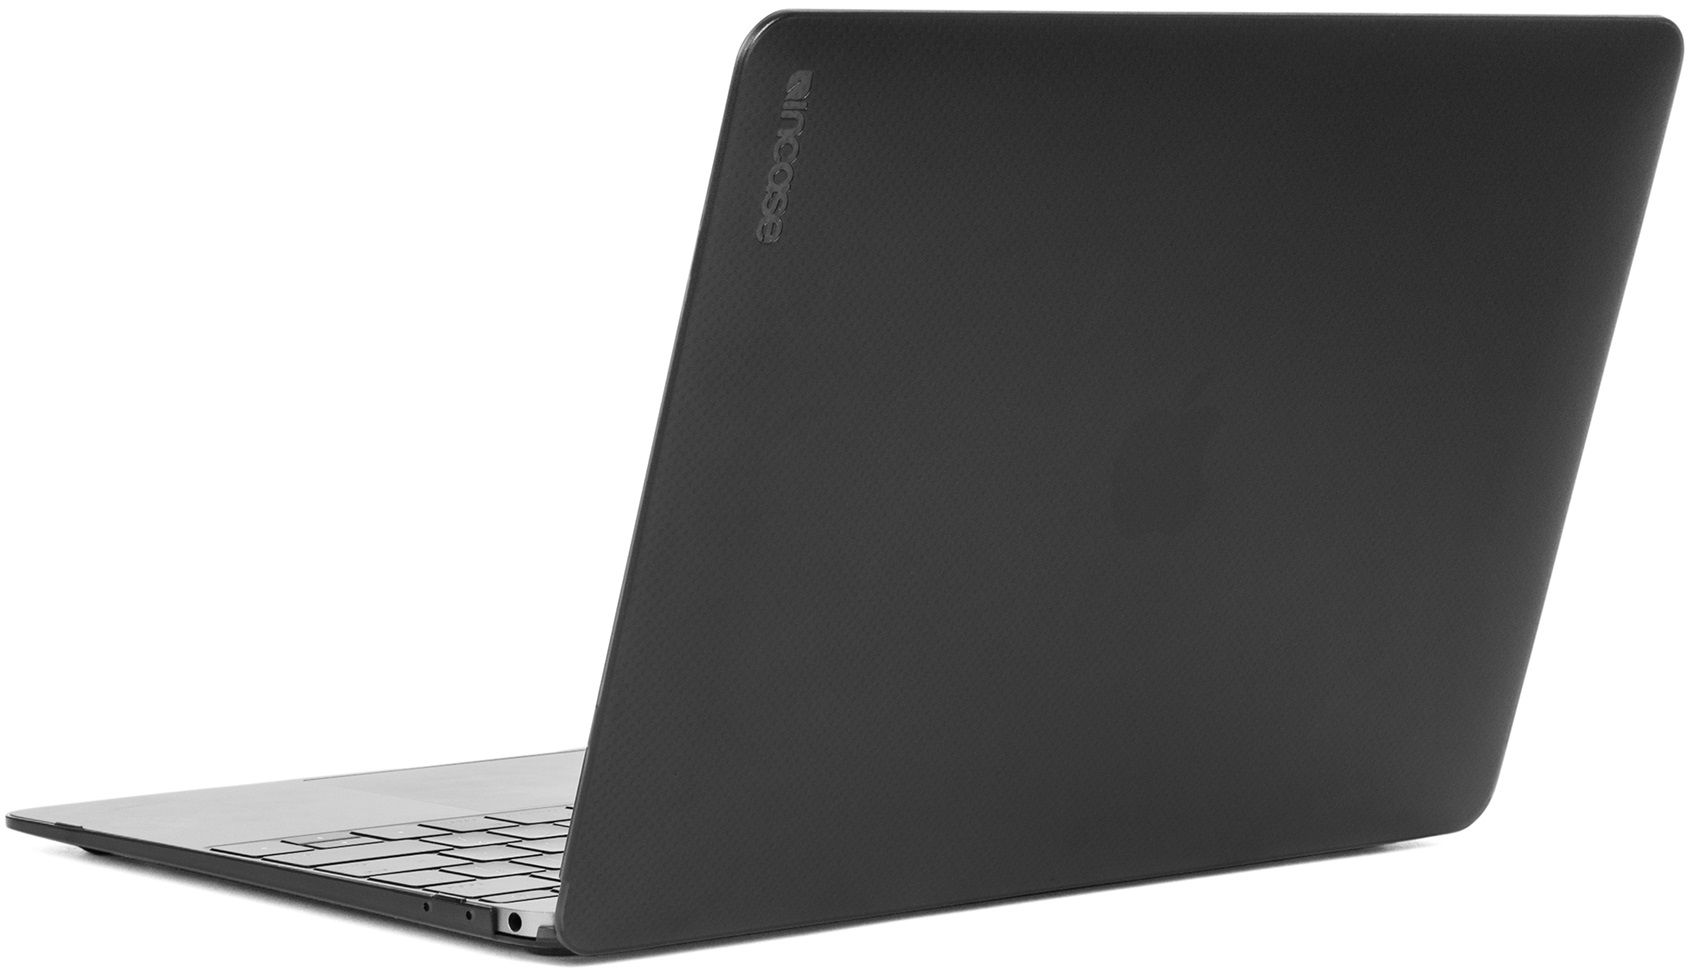 Hardshell CaseНакладки для Macbook<br>Чехол<br>